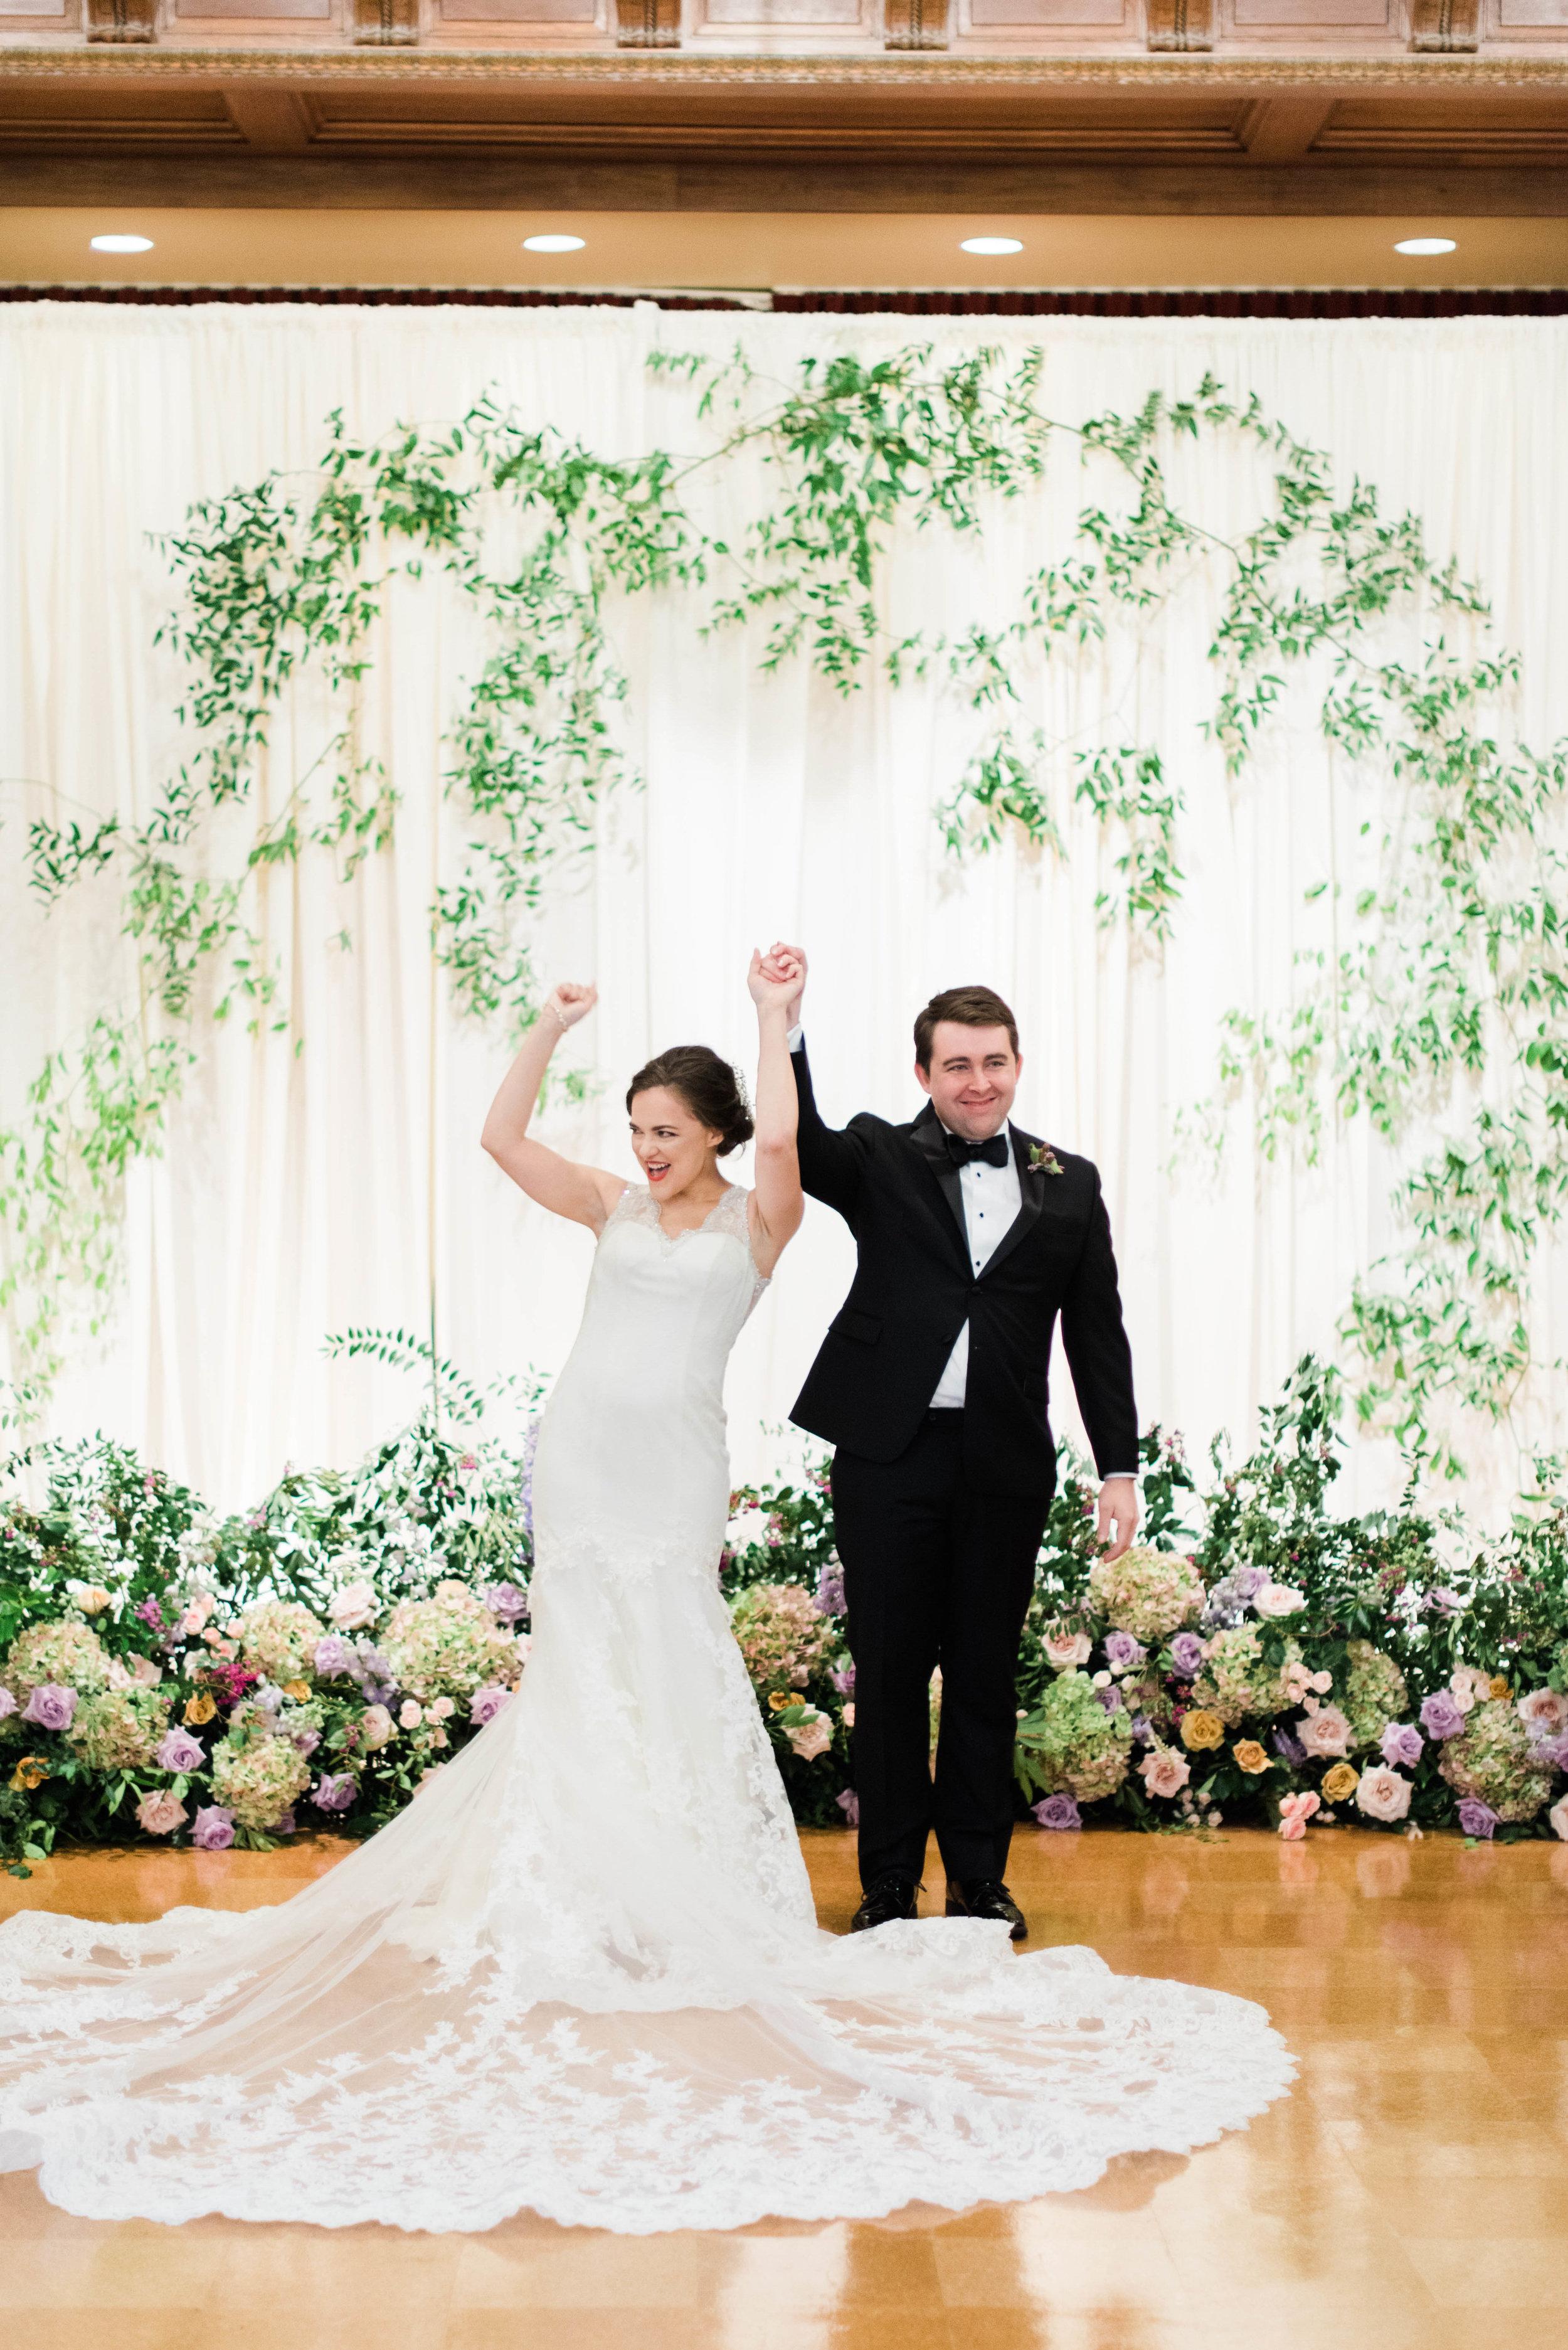 The-Knot-Texas-Fine-Art-Wedding-Film-Destination-Photographer-Houston-Austin-Dallas-New-Orleans-Julia-Ideson-Library-Event-Dana-Josh-Fernandez-Photograph-Top-Best-11.jpg